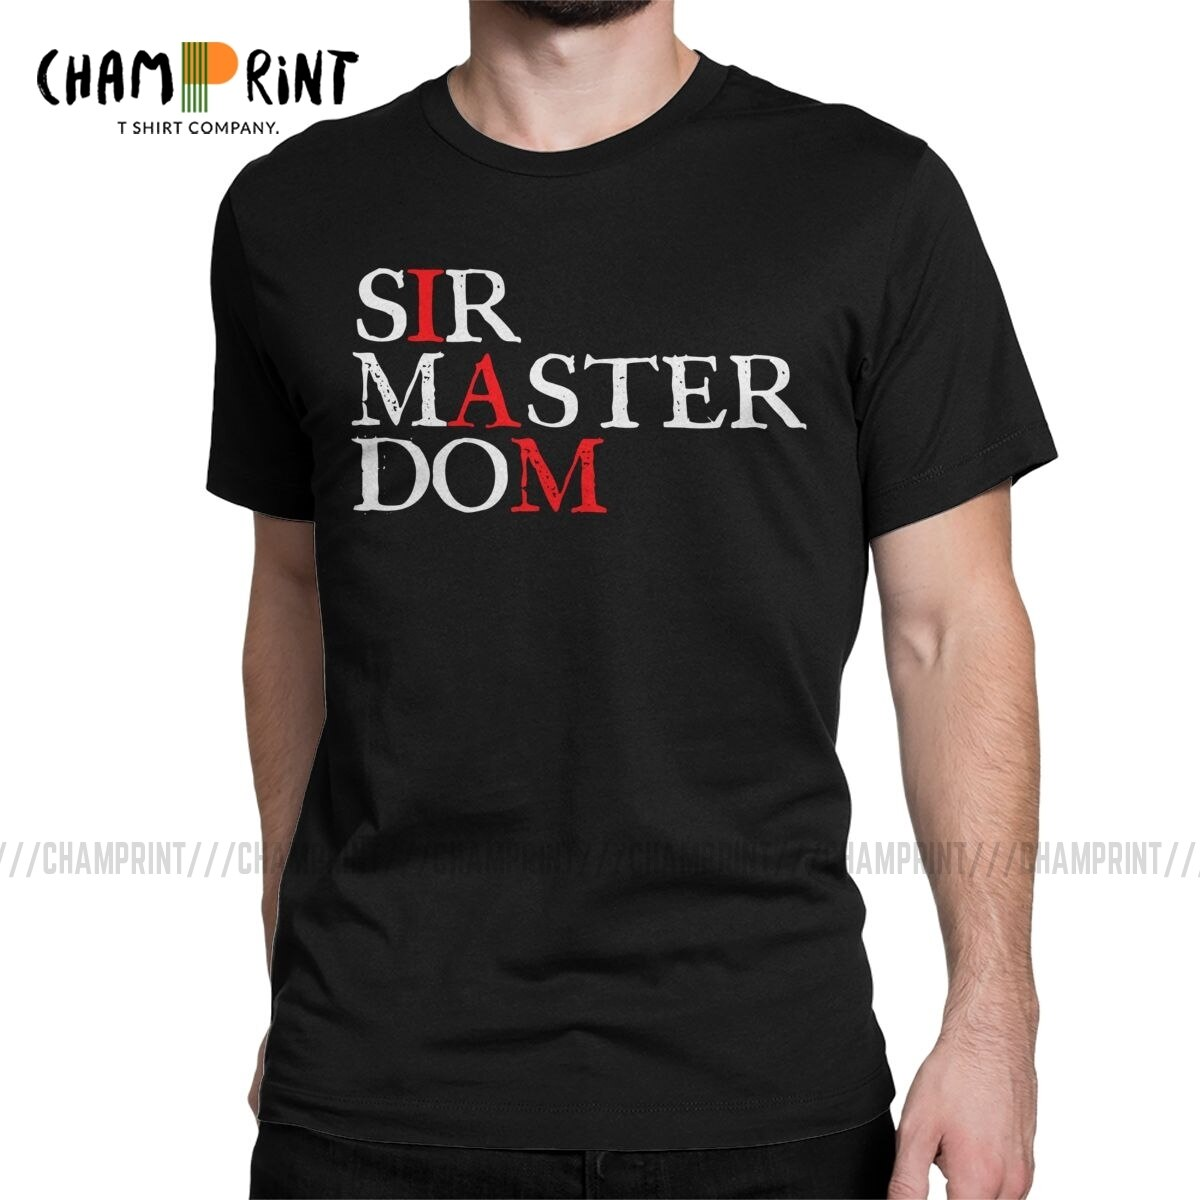 Camisetas de hombres dominantes soy BDSM Dominant esclavo sometido a juego Sexy Sub Creative Tees Camiseta de cuello redondo regalo Idea ropa